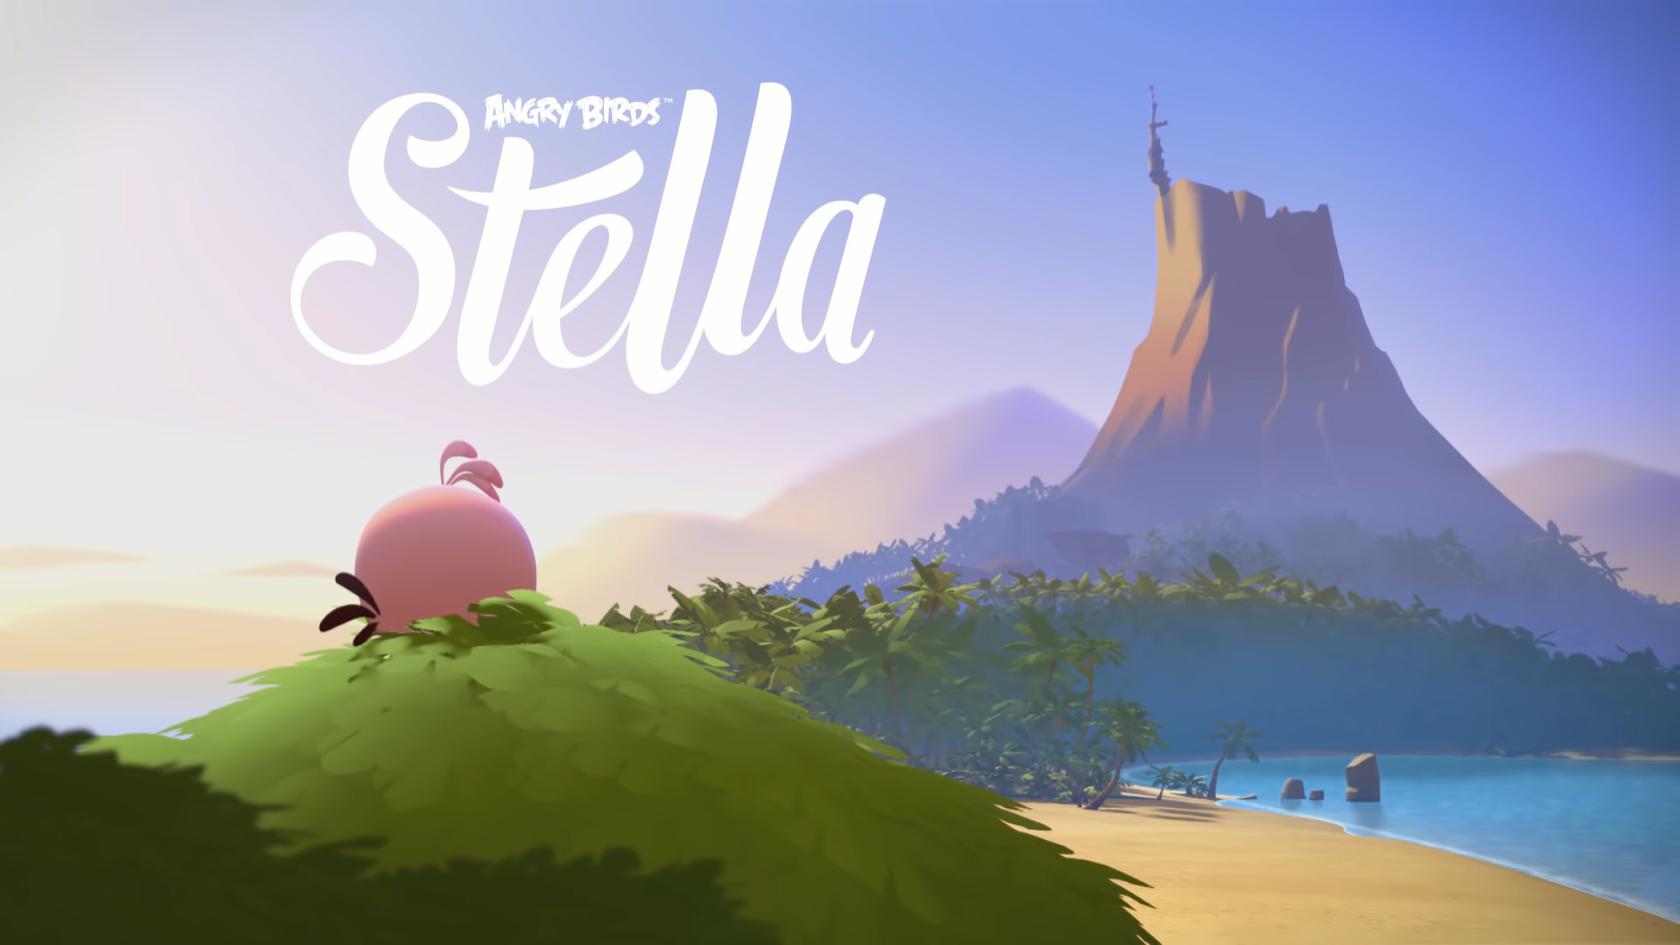 Angry Birds Stella (TV series) | Angry Birds Wiki | FANDOM powered